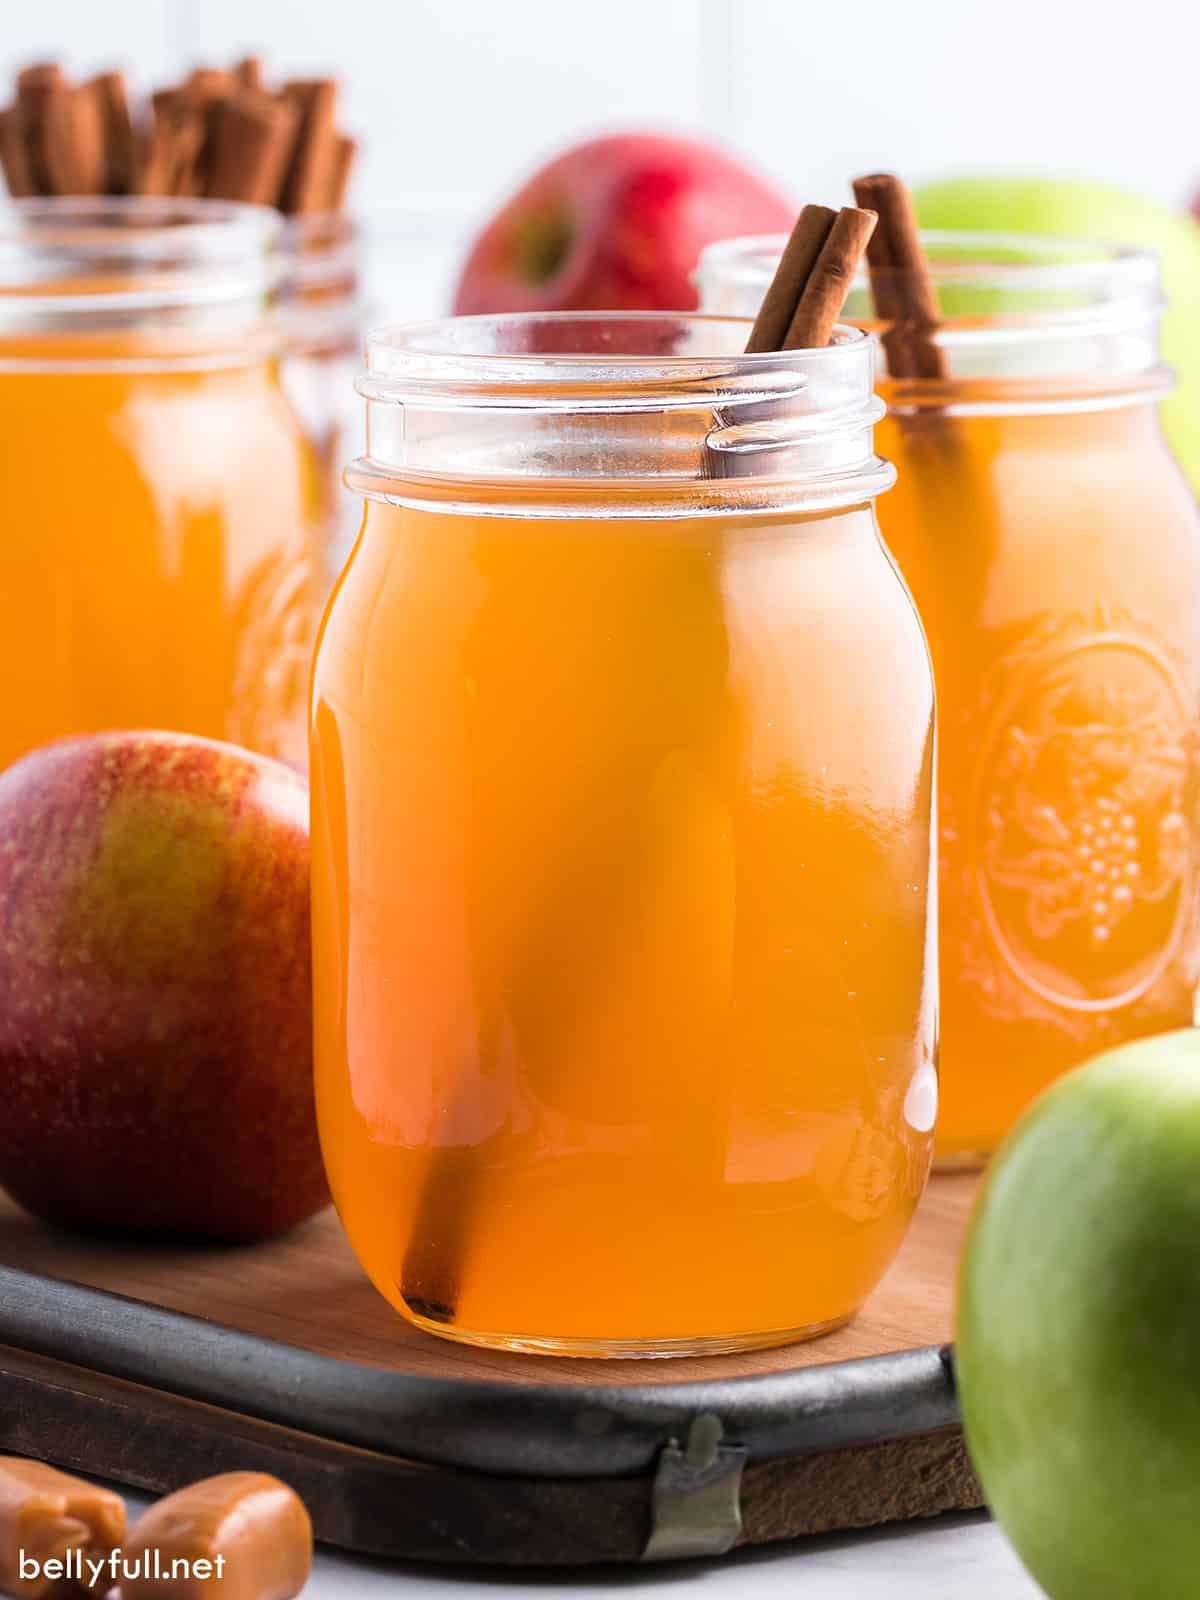 Mason jars of homemade apple pie moonshine garnished with a cinnamon stick